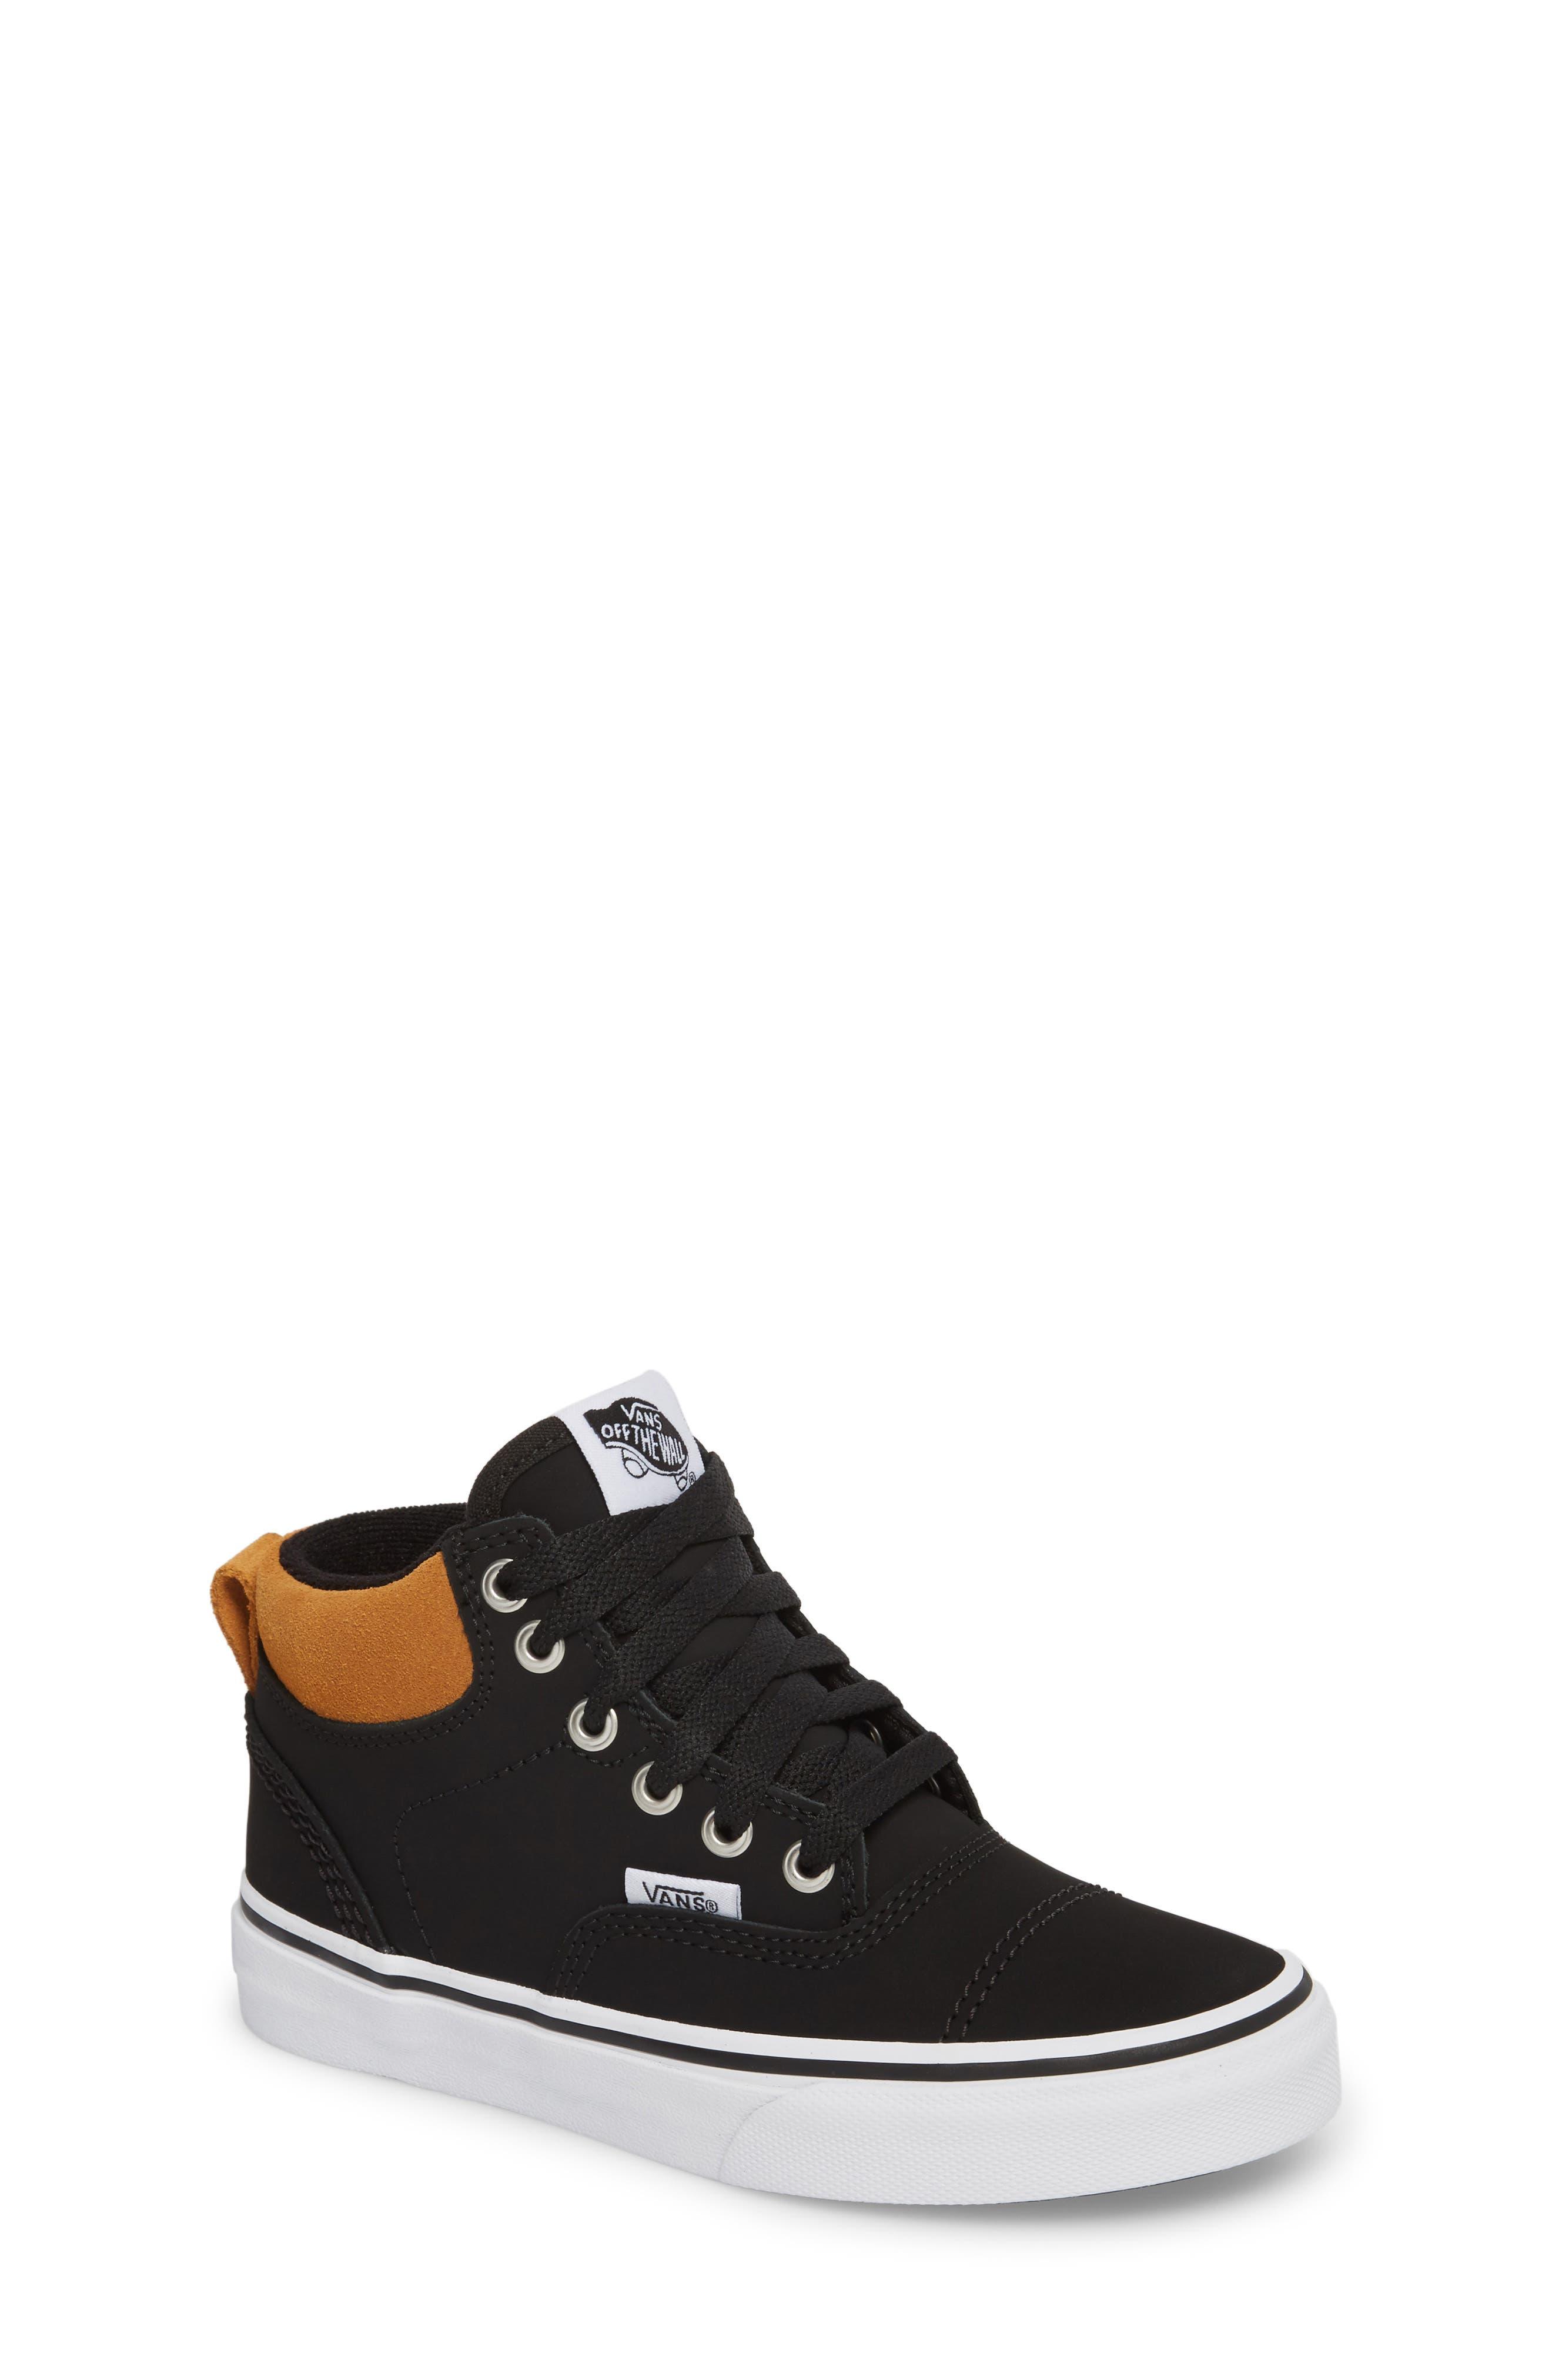 Era - Hi Sneaker,                             Main thumbnail 1, color,                             Vansbuck Black/ Cathay Spice